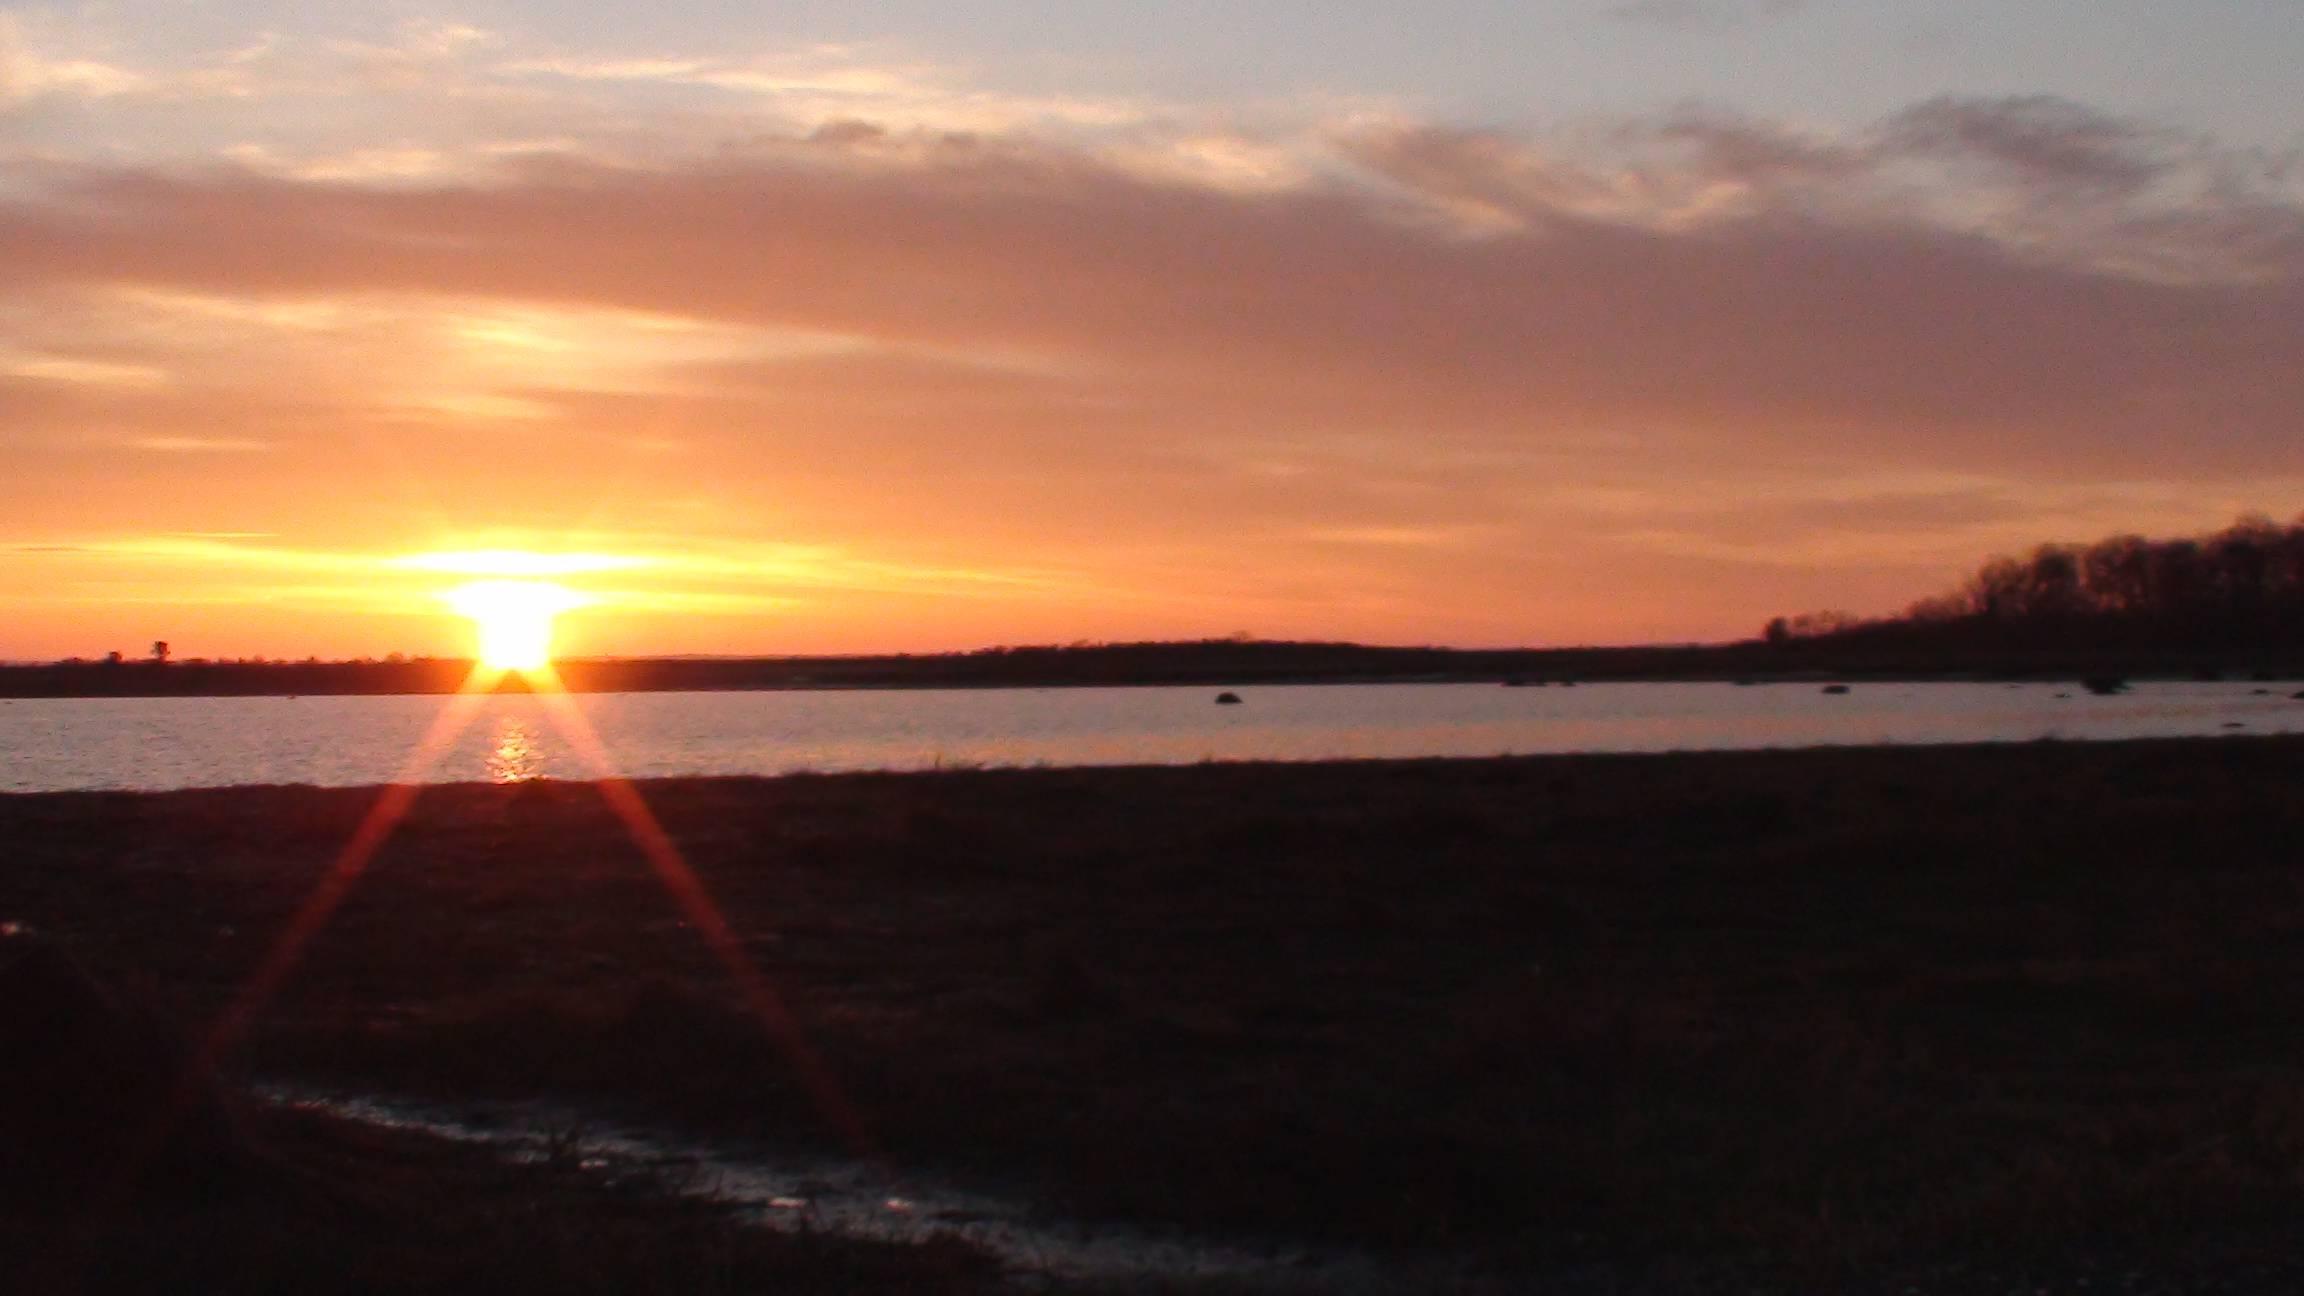 West Island Sunrise April 30, 2013 5:41AM